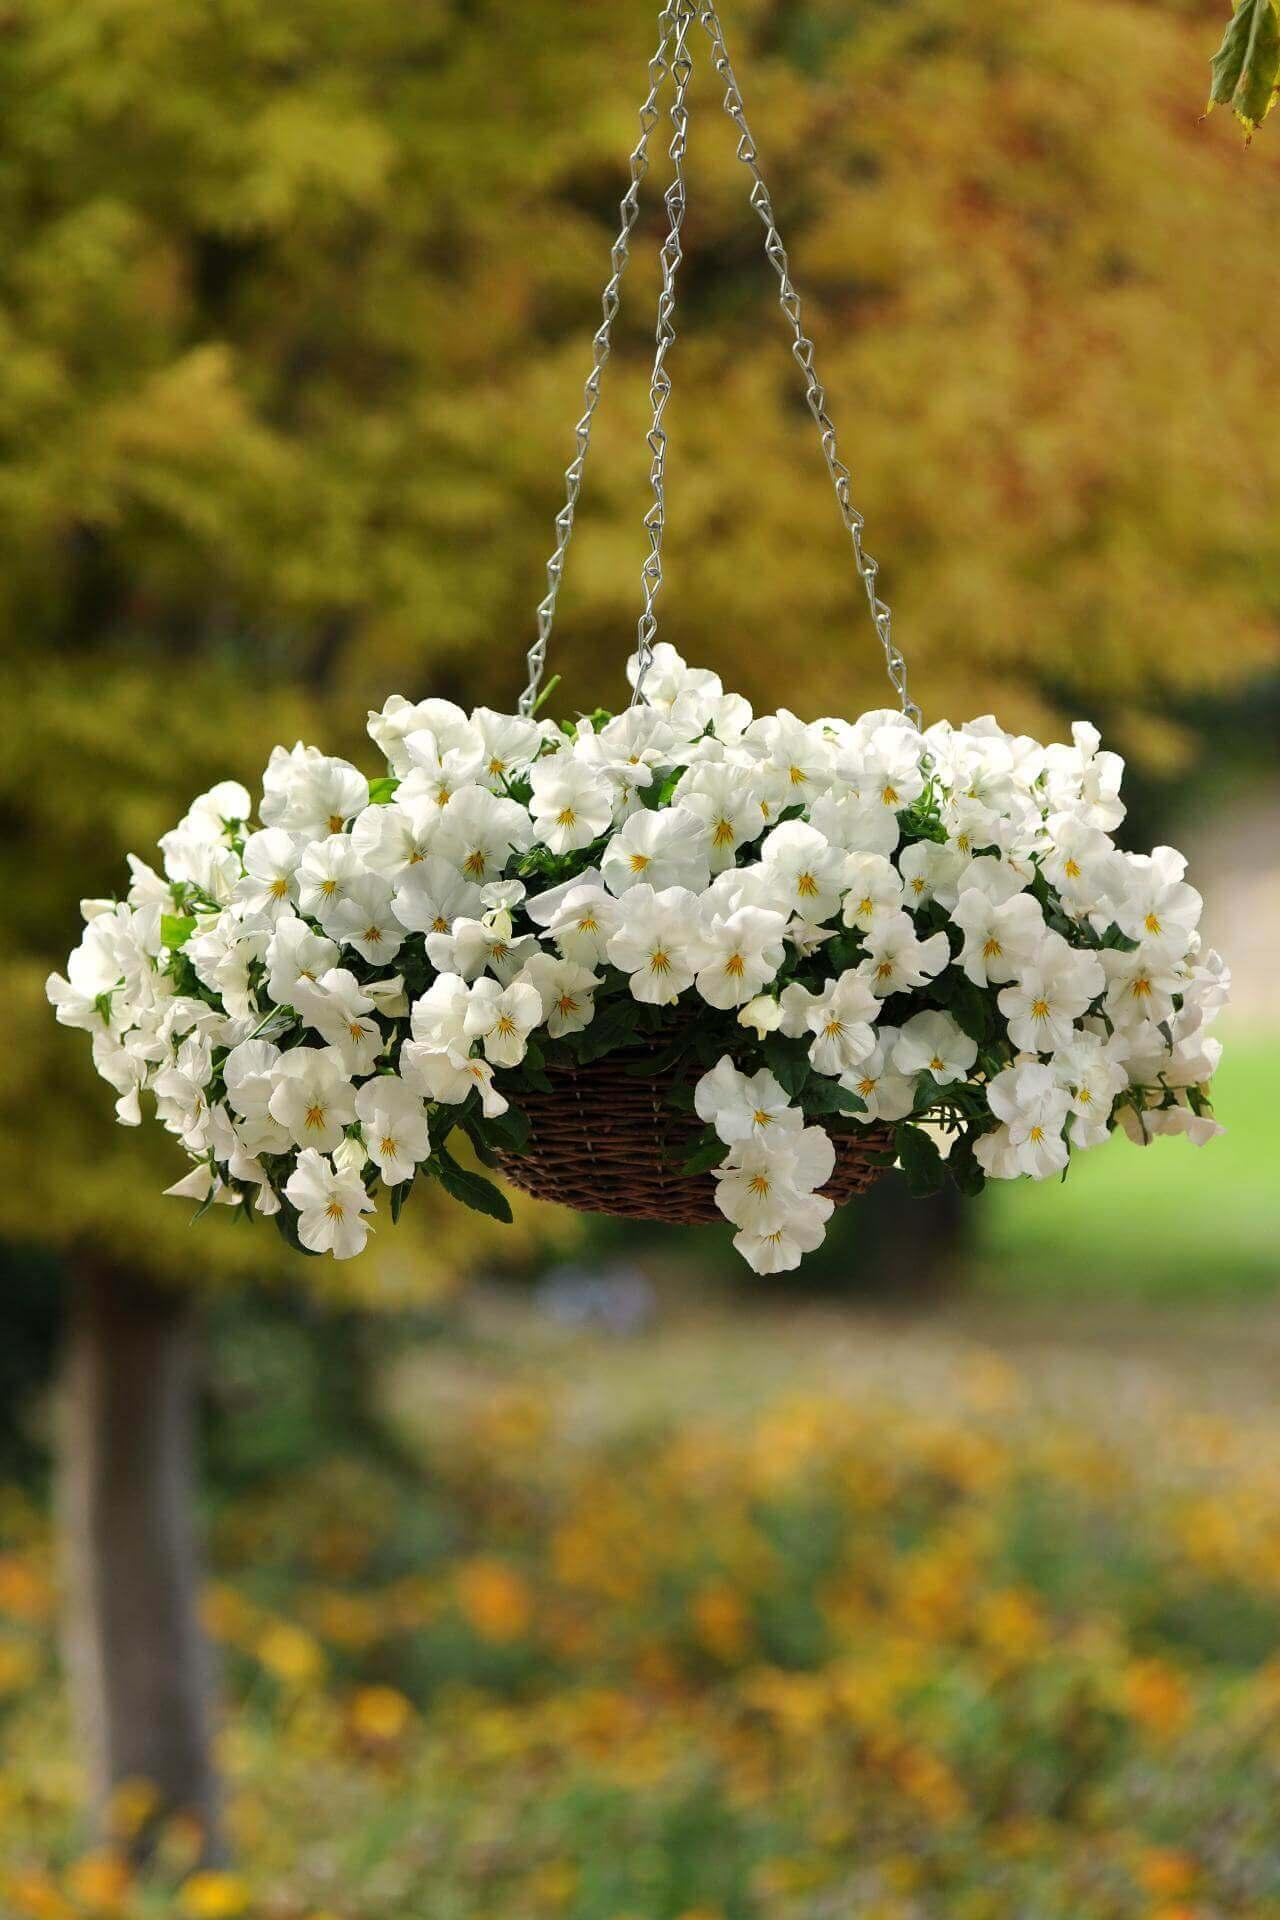 Sweetly Simple Woven Flower Basket